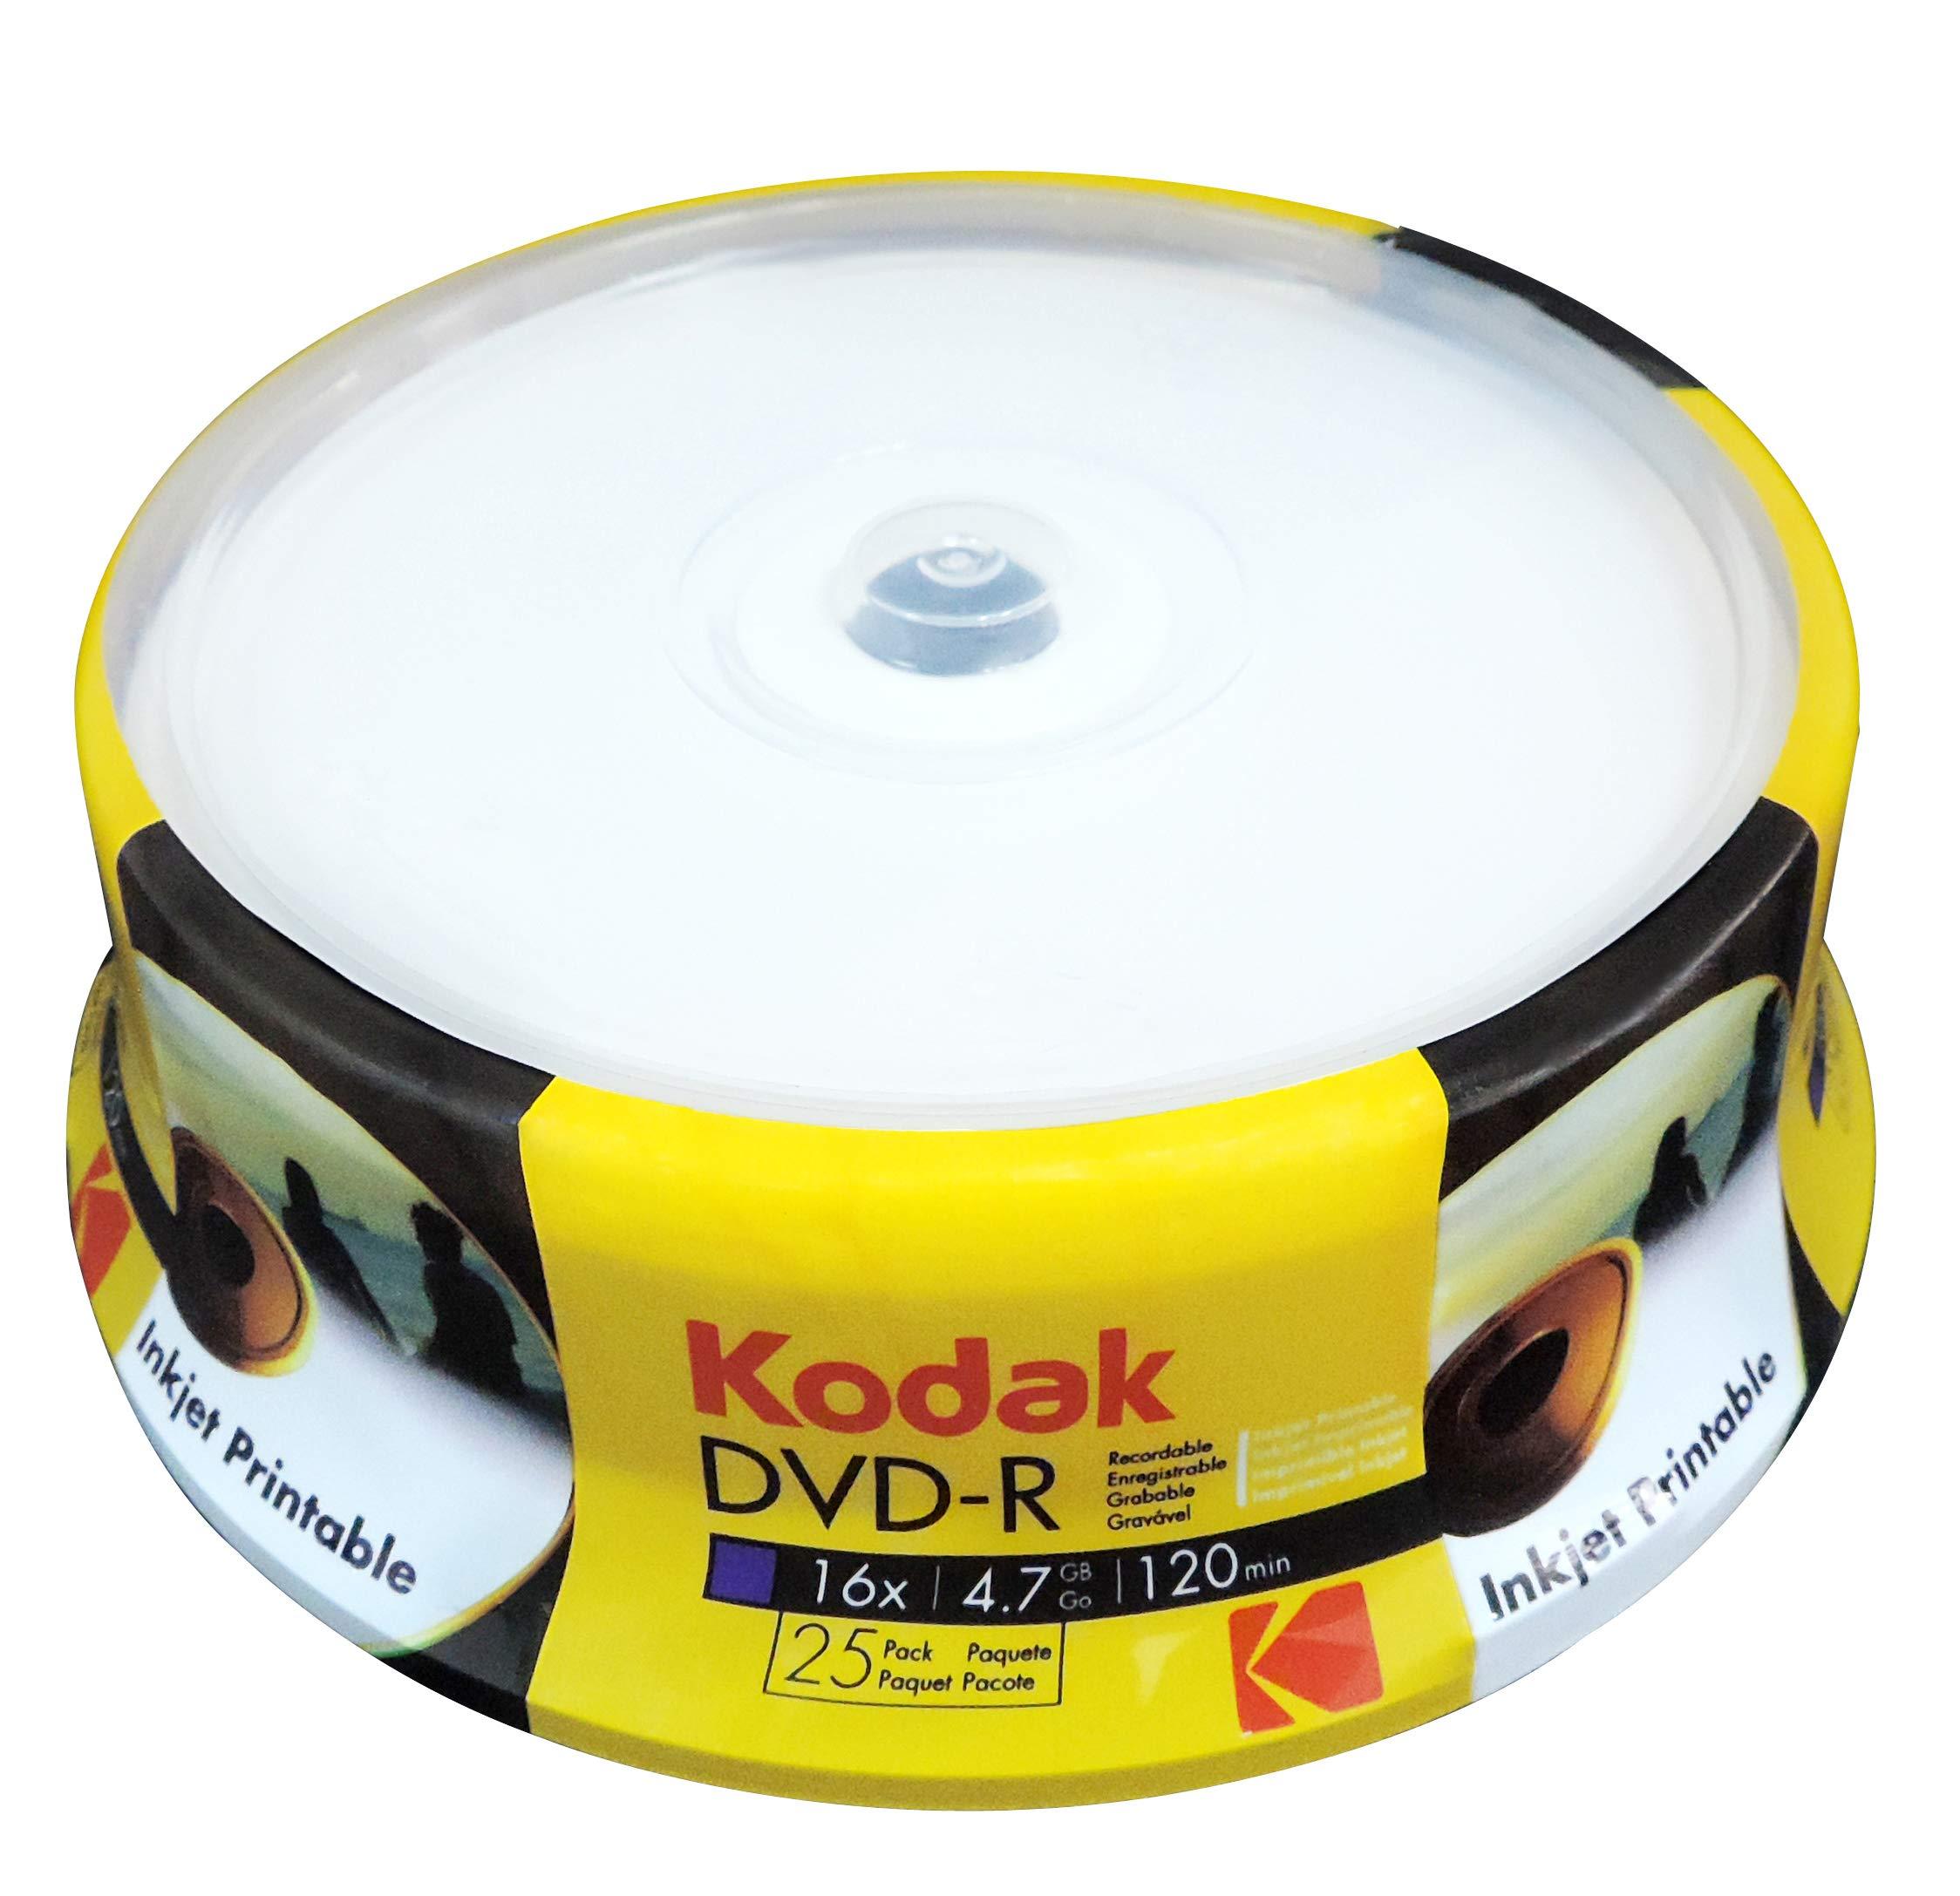 Kodak DVD-R 4.7 GB/120 Min 16x, Imprimible, 25 Piezas en Caja ...